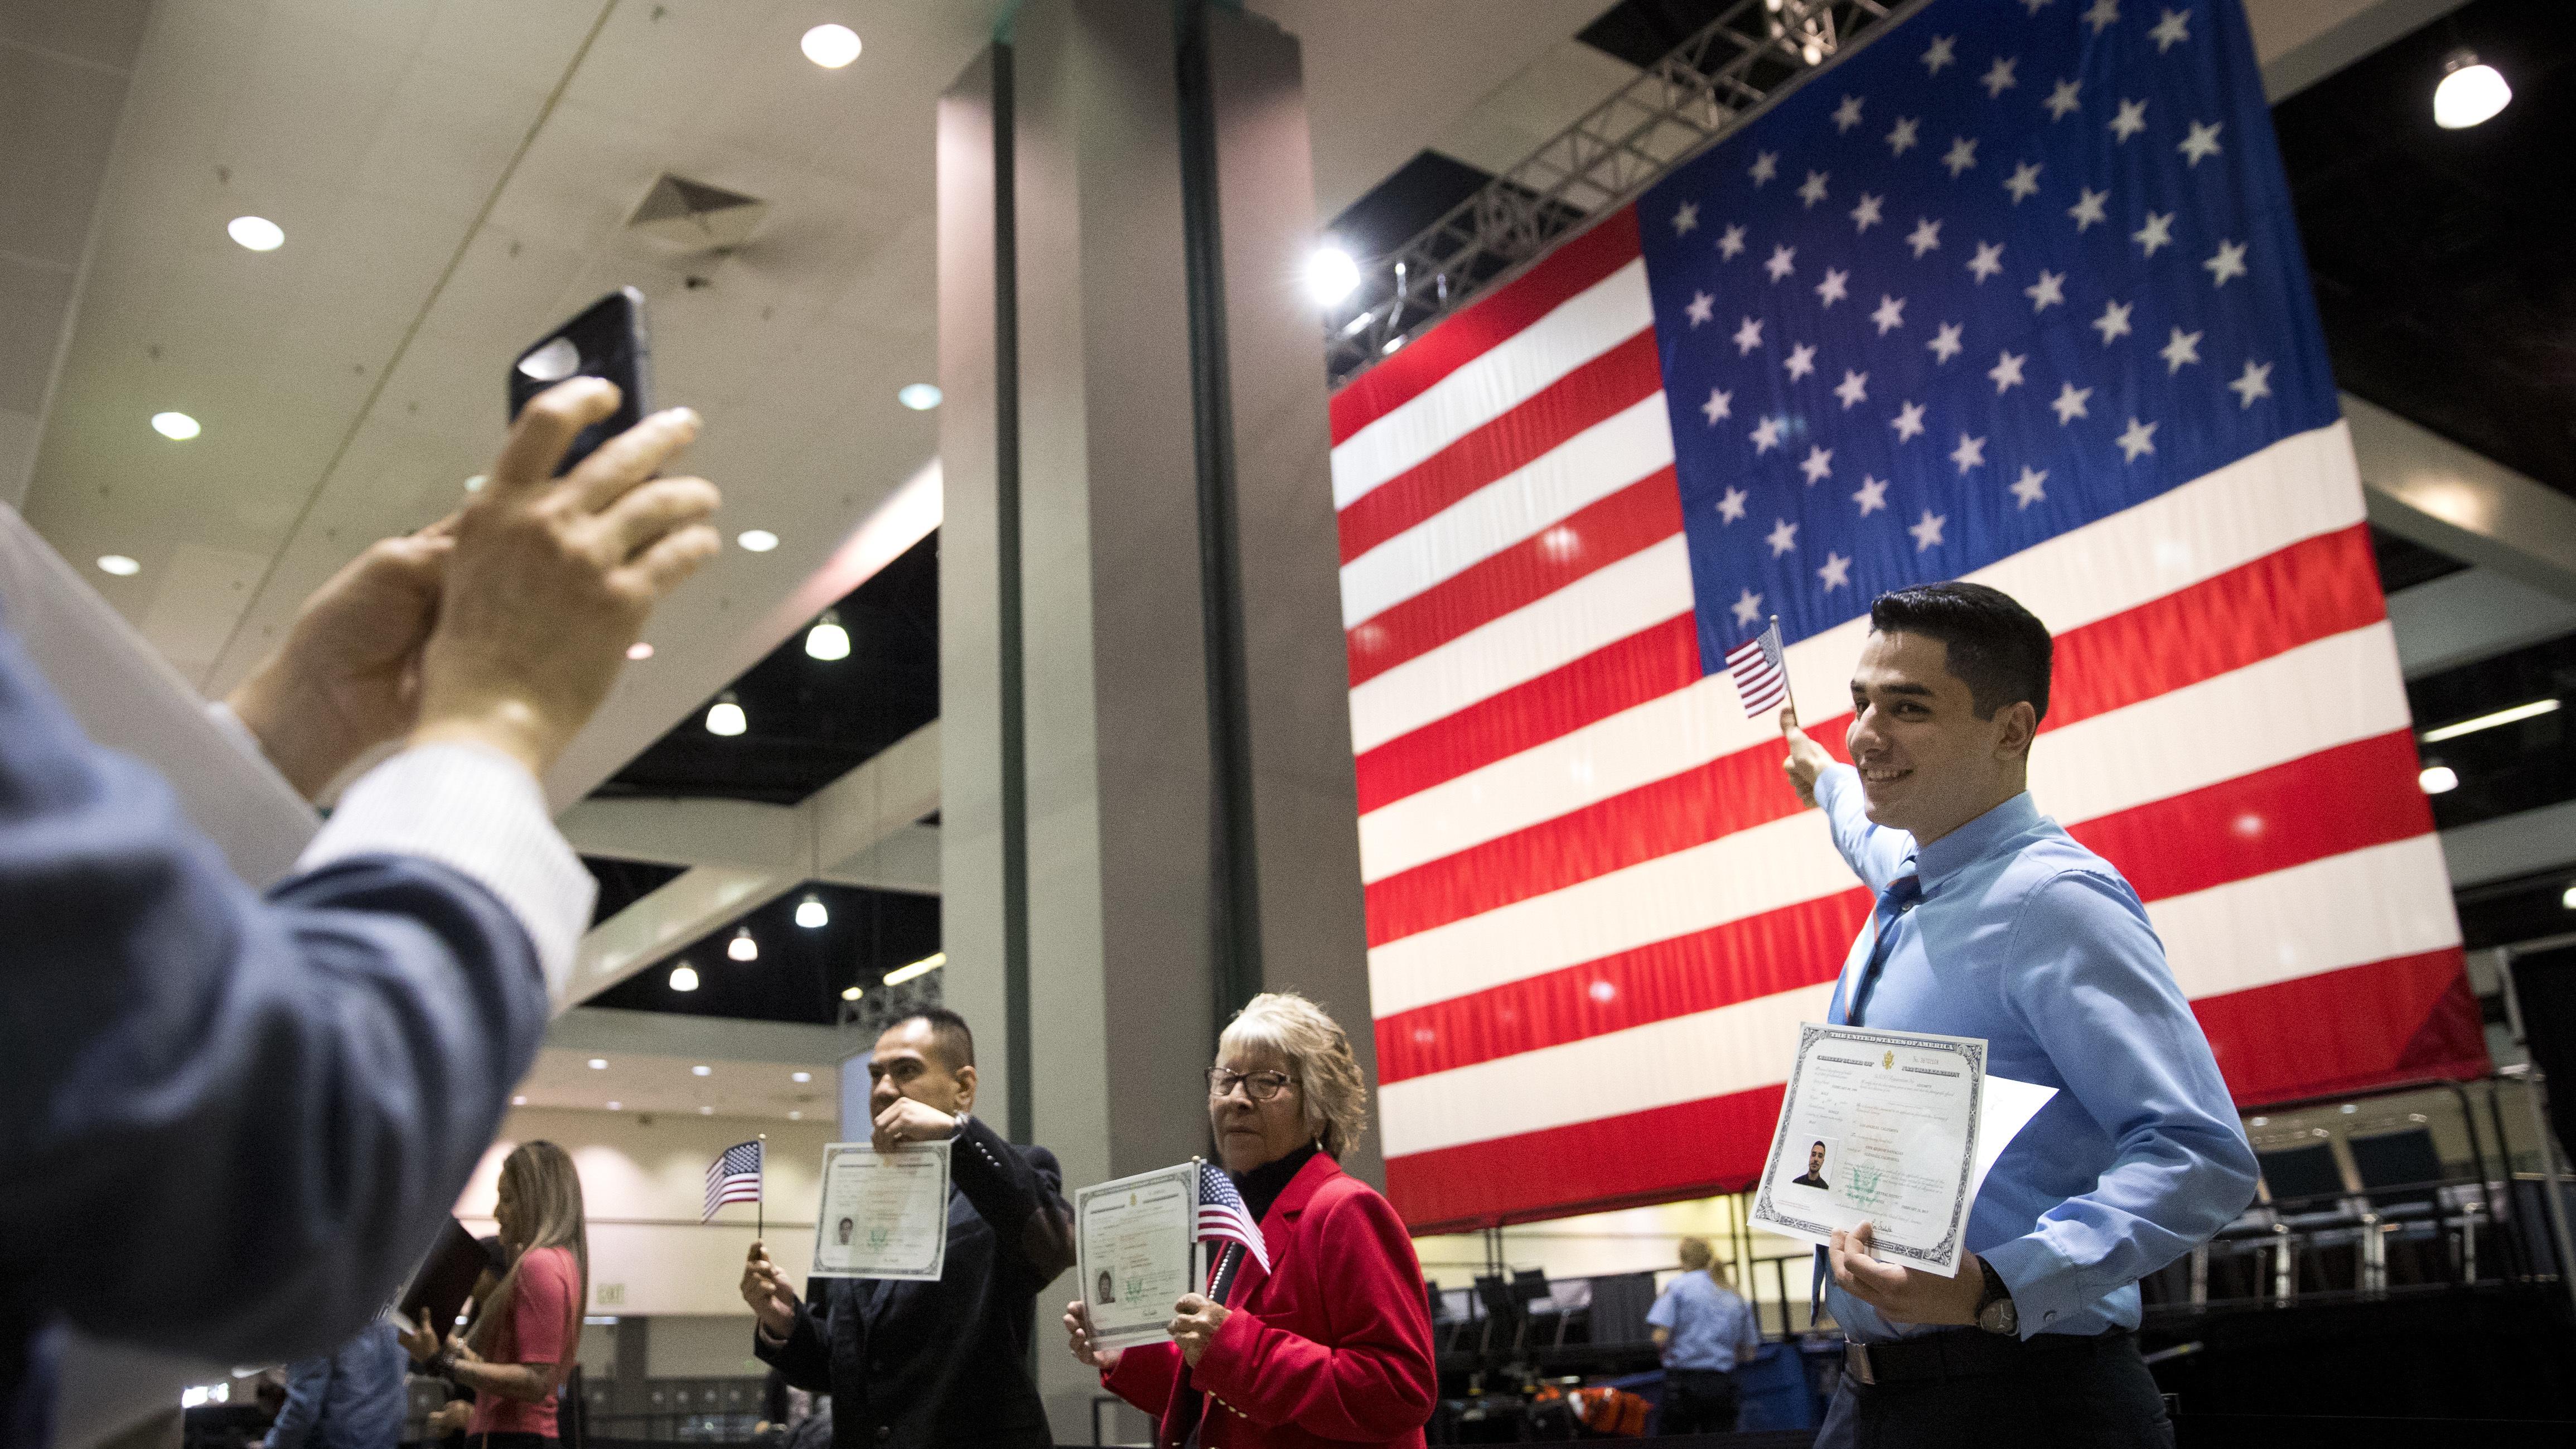 Supreme Court Voids Citizenship Law Gender Distinction